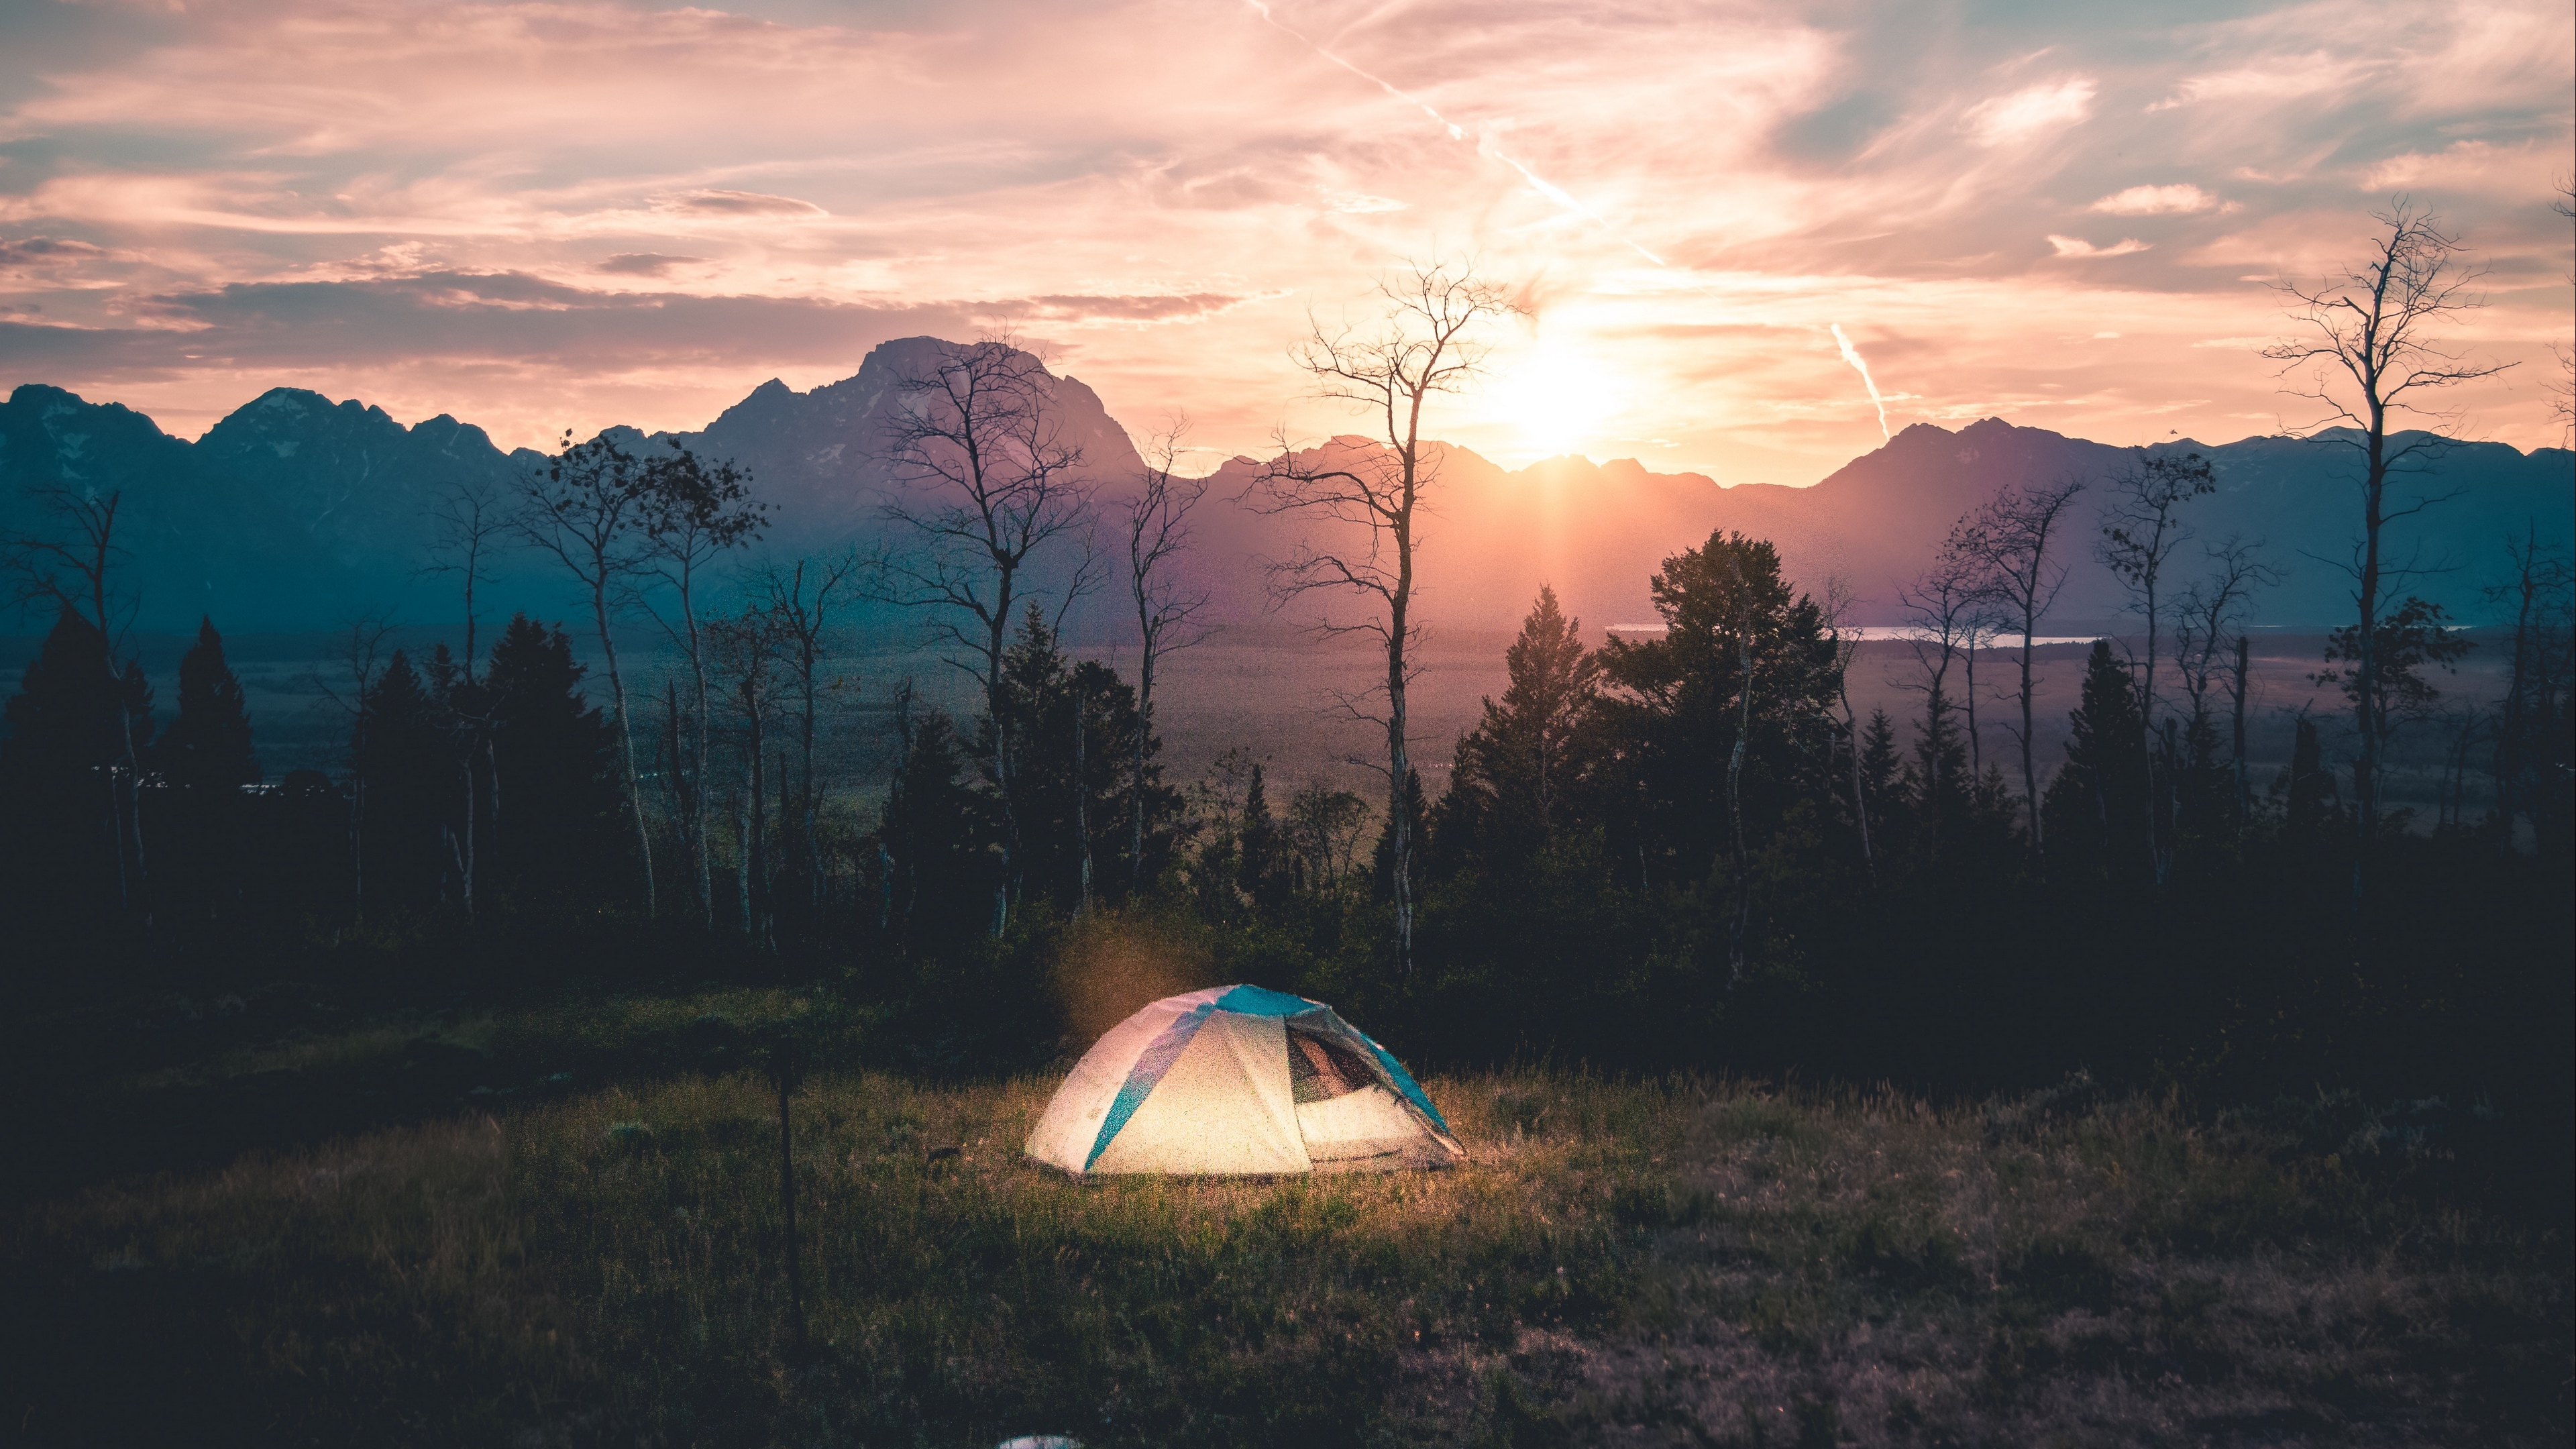 tent camping landscape 4k 1541114049 - tent, camping, landscape 4k - tent, Landscape, Camping